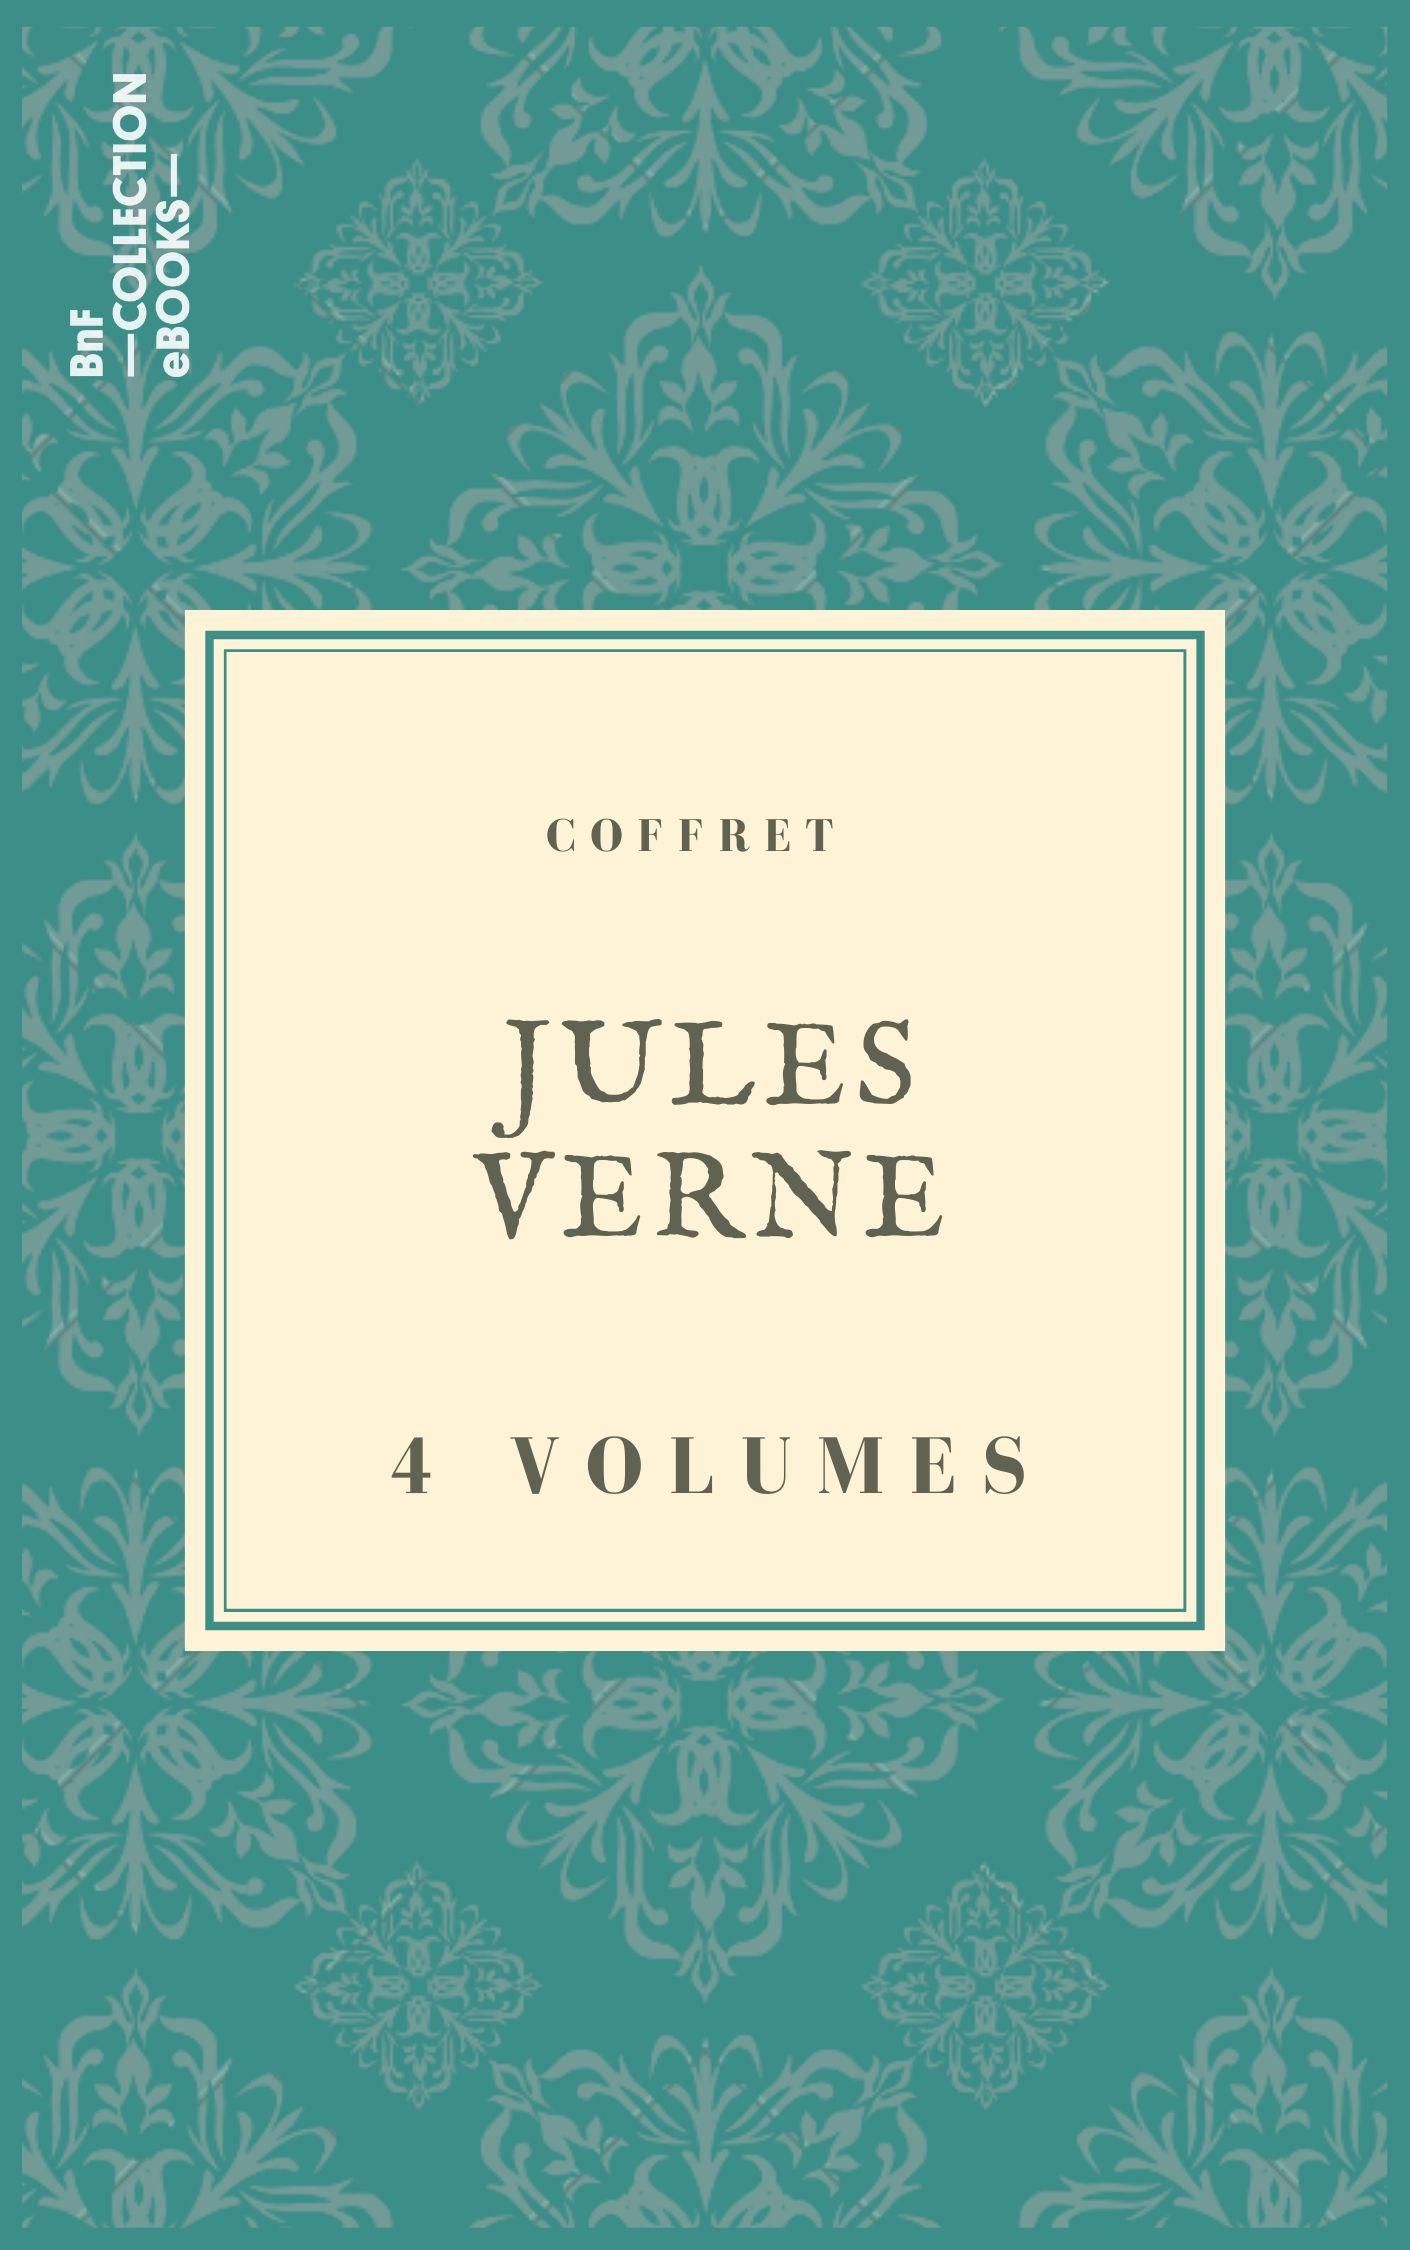 Vignette du livre Coffret Jules Verne